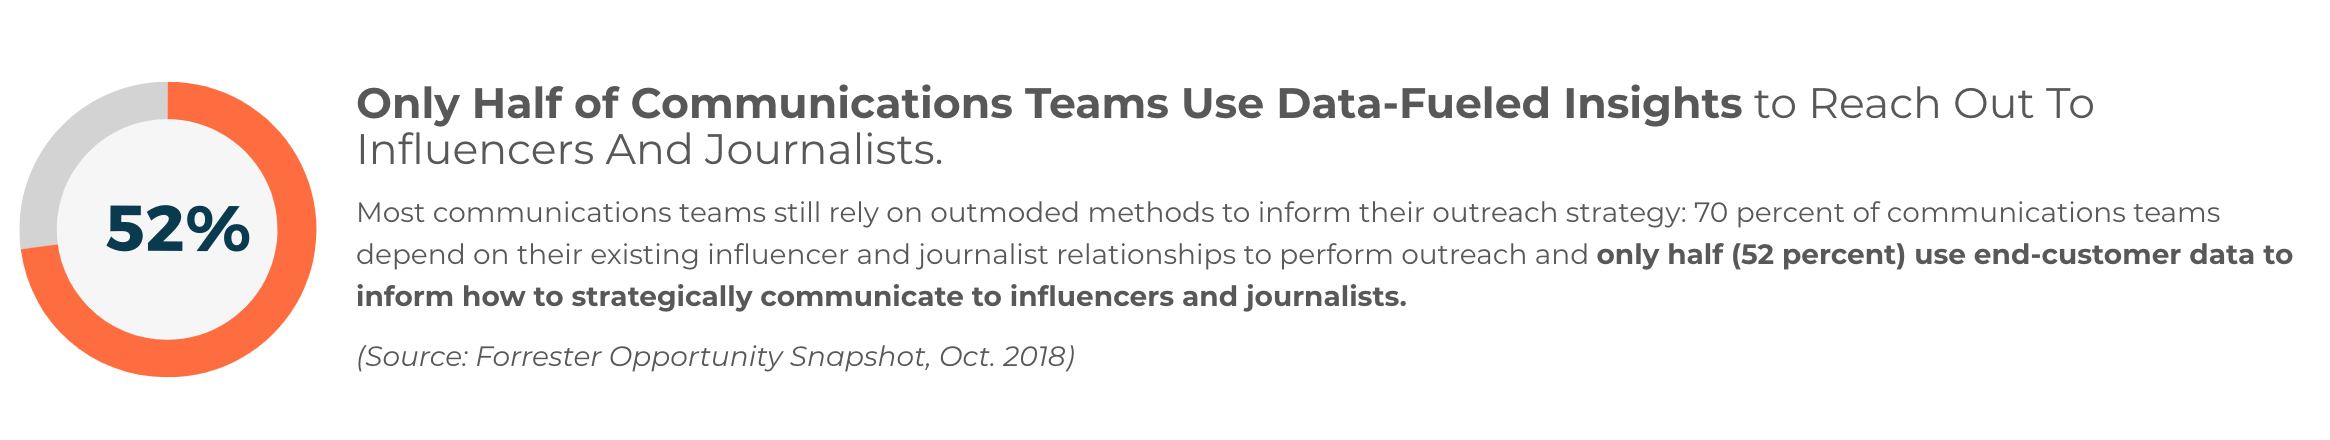 Comms Team Data Use